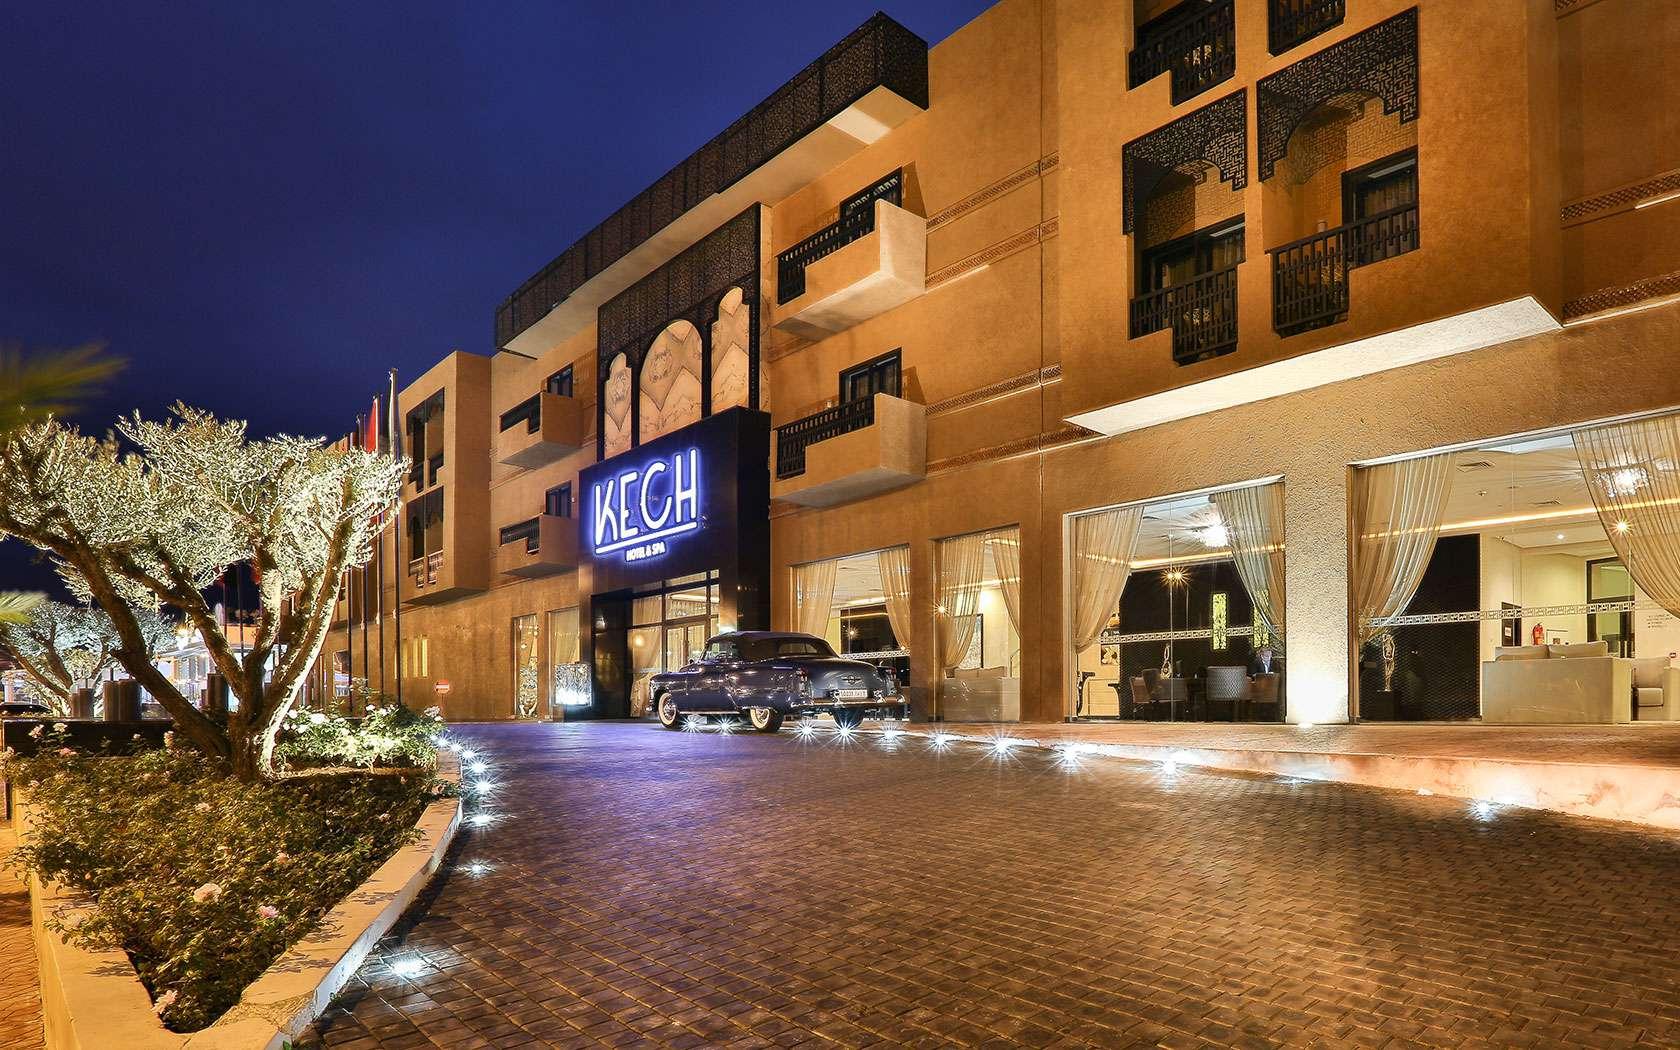 هتل کچ بوتیک مراکش | Kech Boutique Hotel & Spa